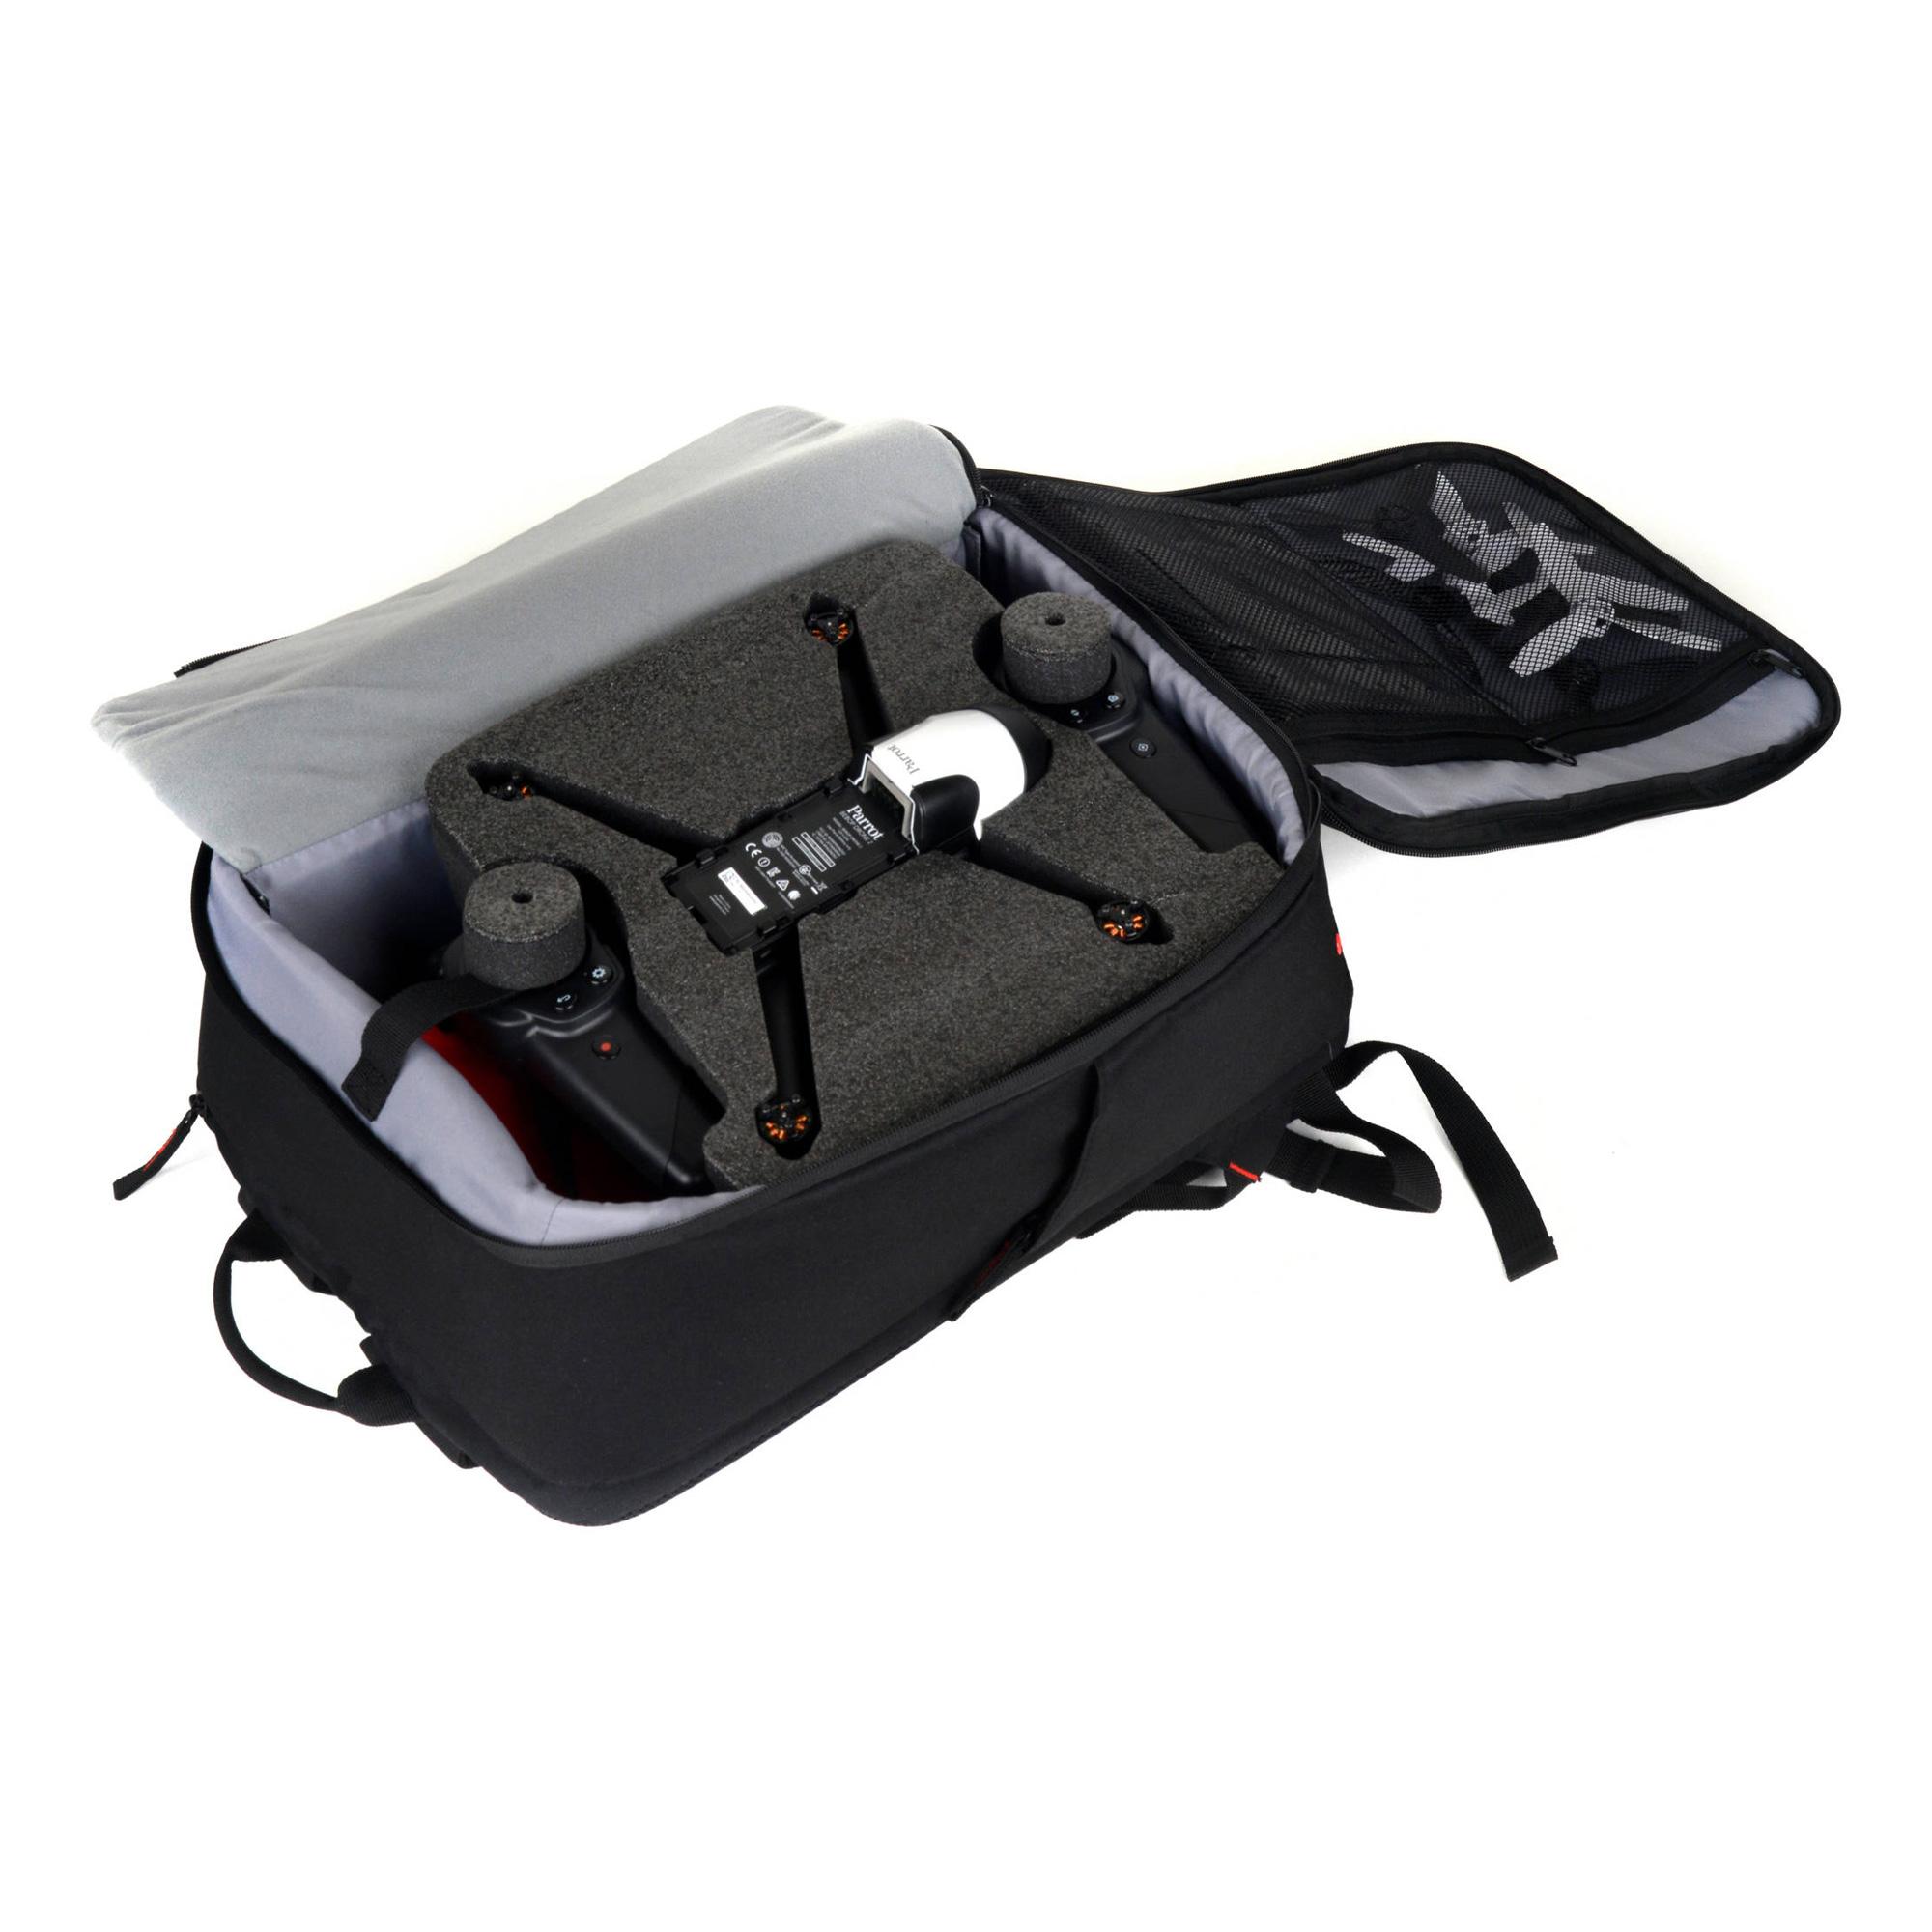 Backpack for BeBop 2 Drone  Skycontroller